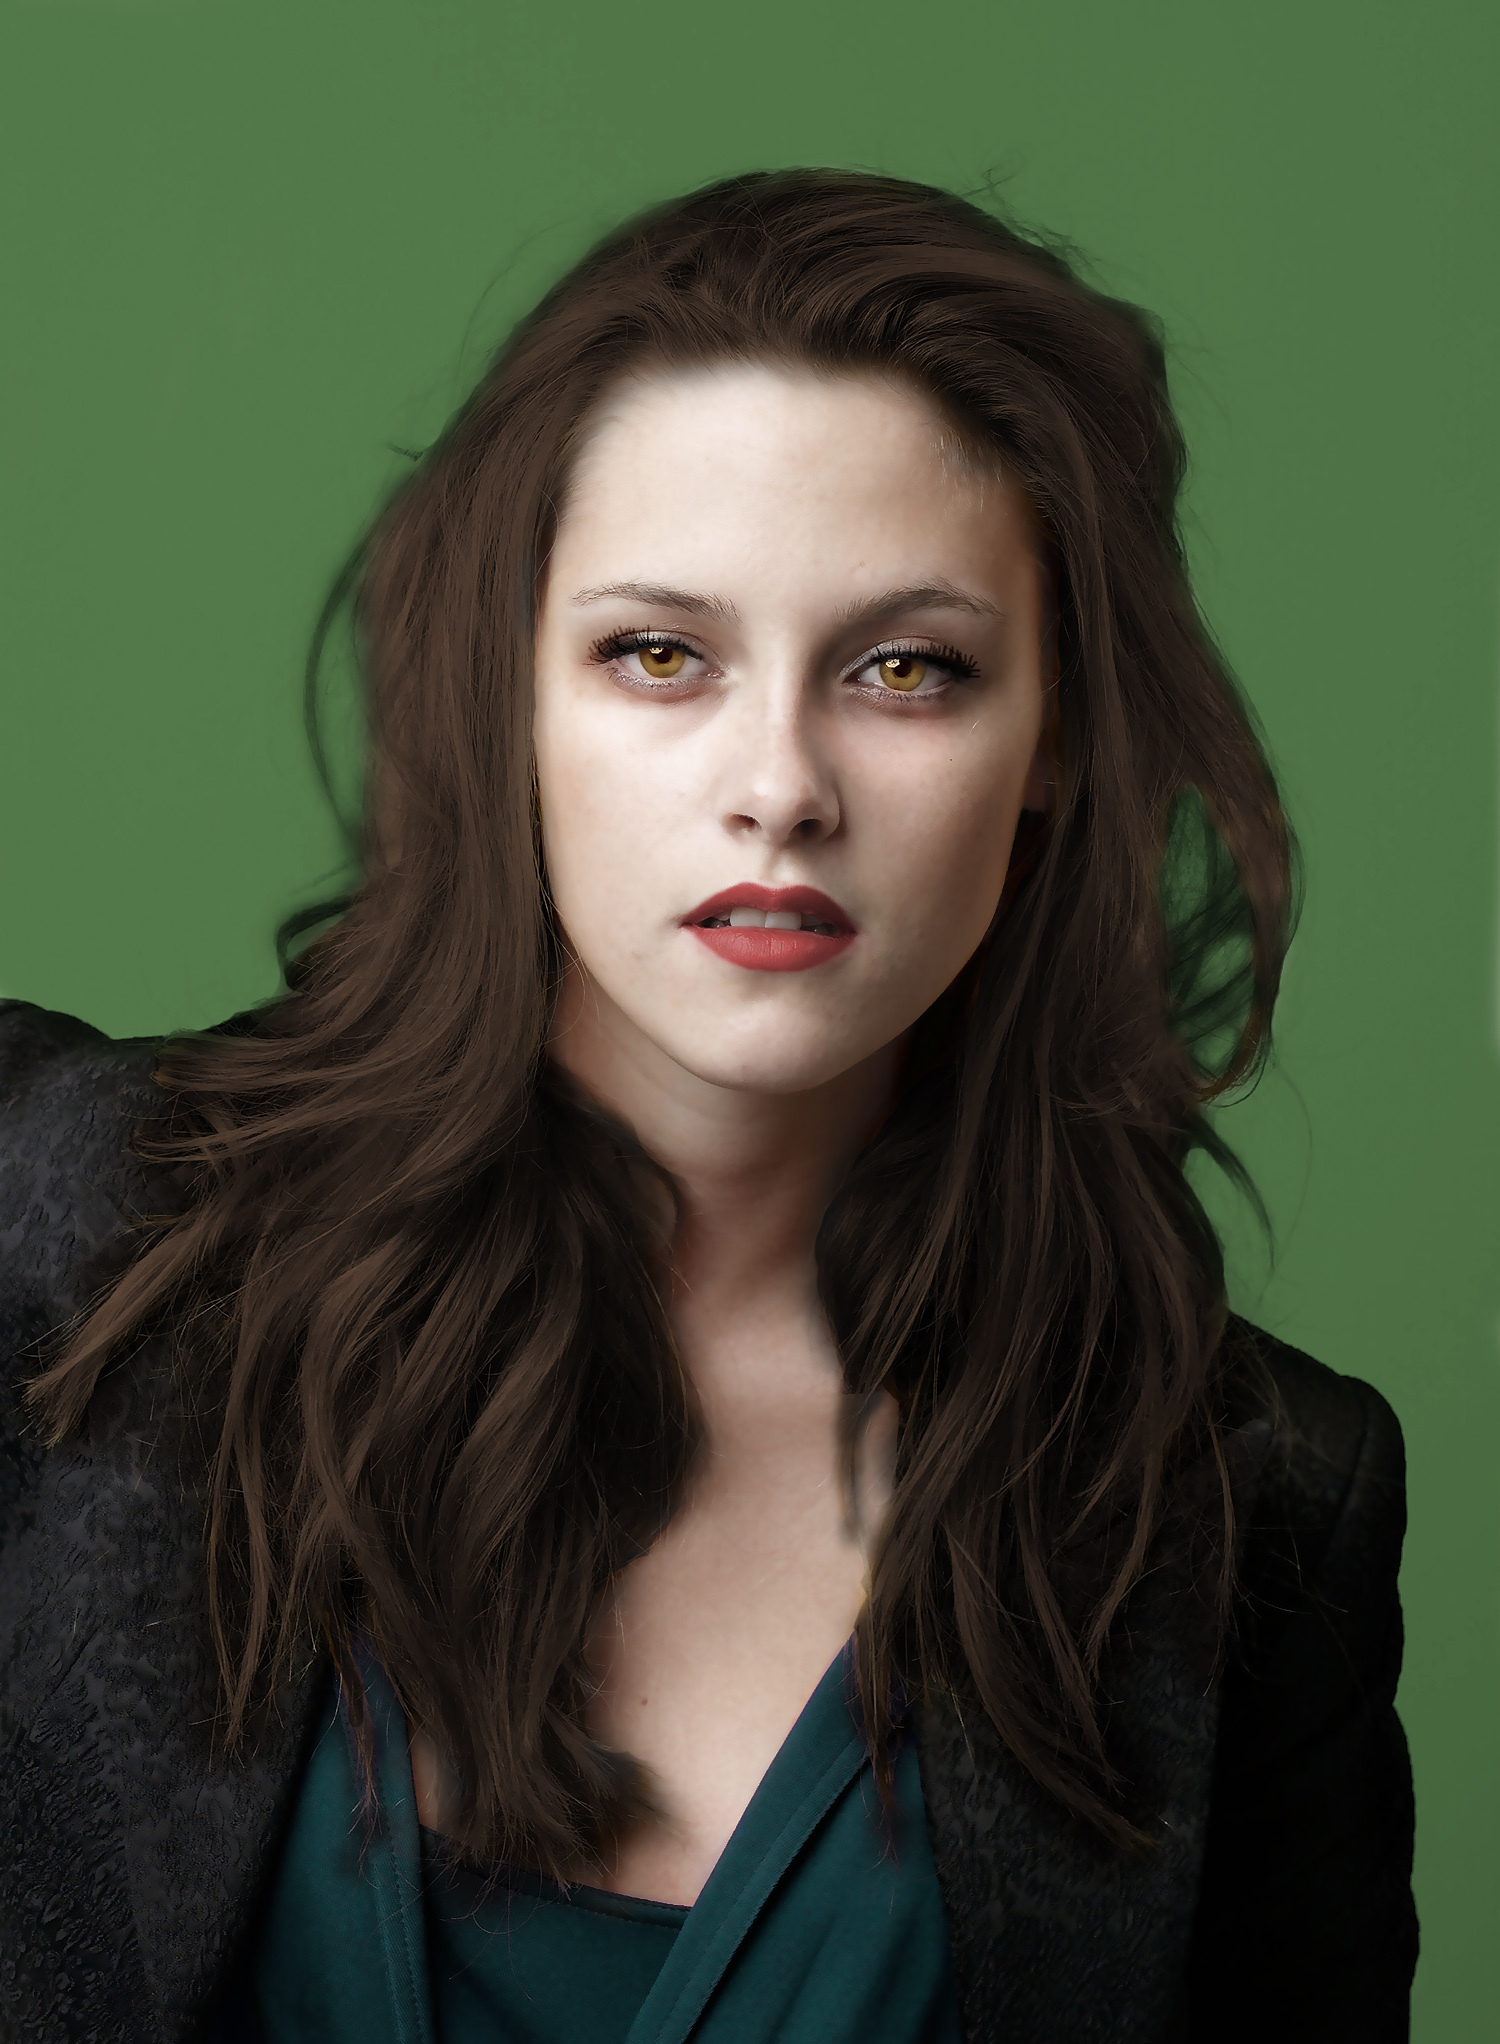 Bella Cullen (Vampire) images bella vamp HD wallpaper and background ... Bella